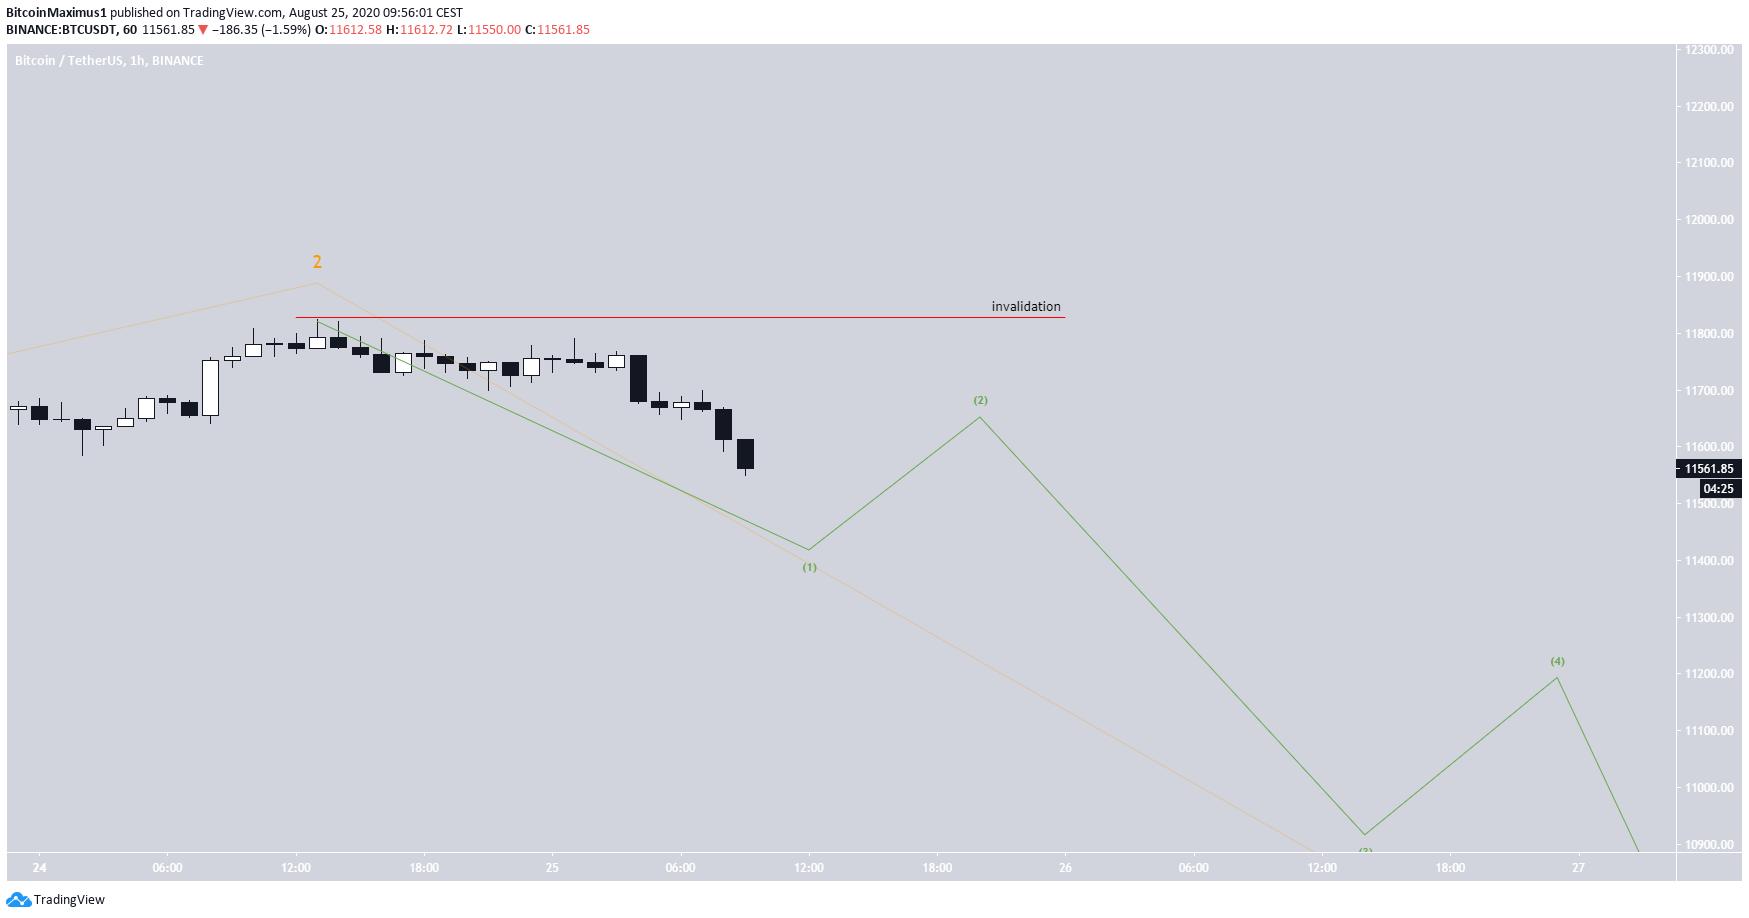 Bitcoin's Short-Term Wave Count